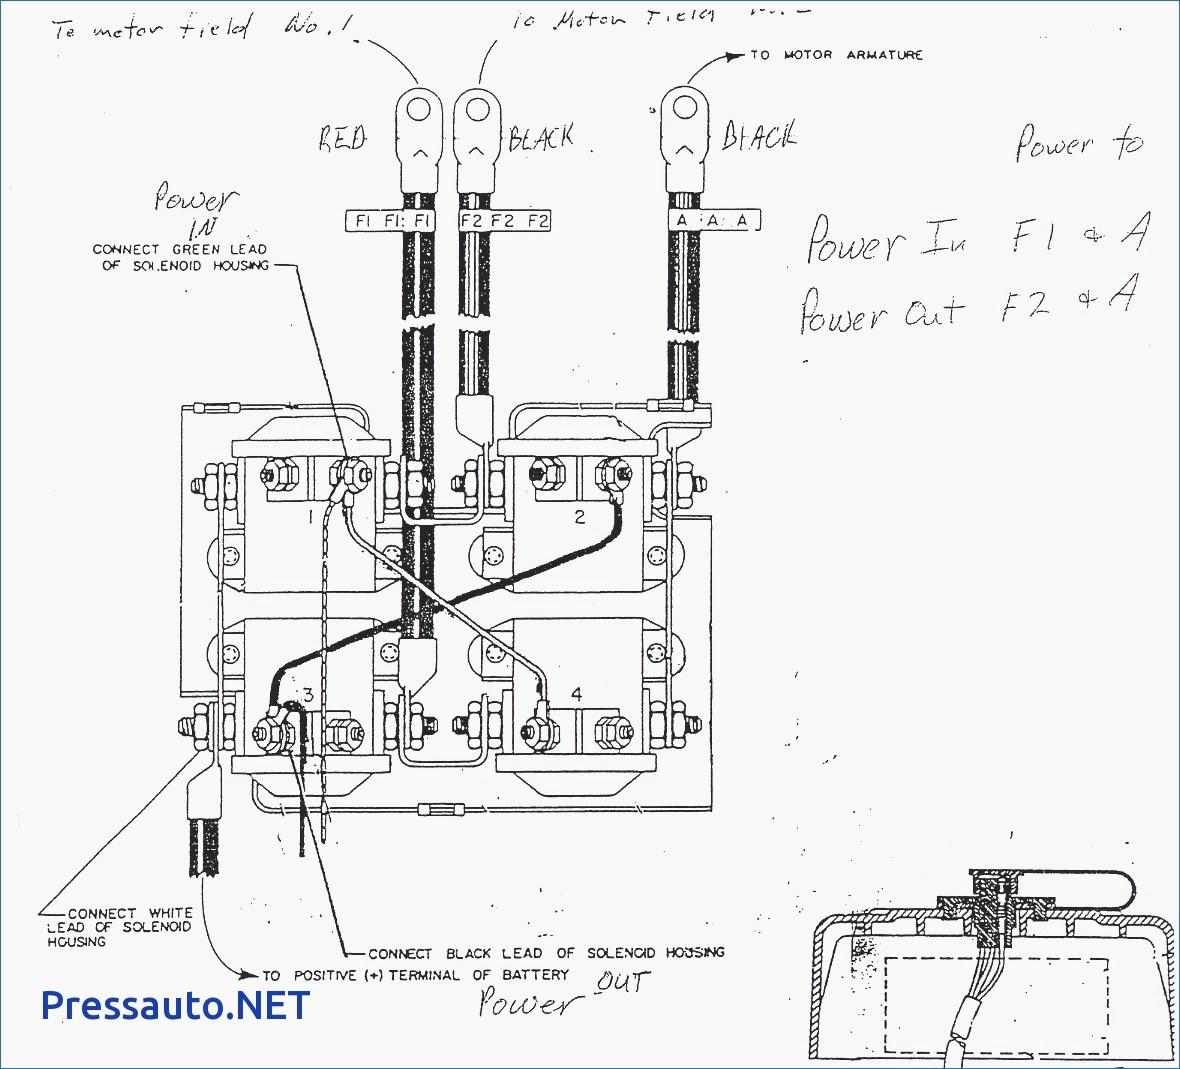 hight resolution of john deere 4430 battery diagram image of deer ledimage co